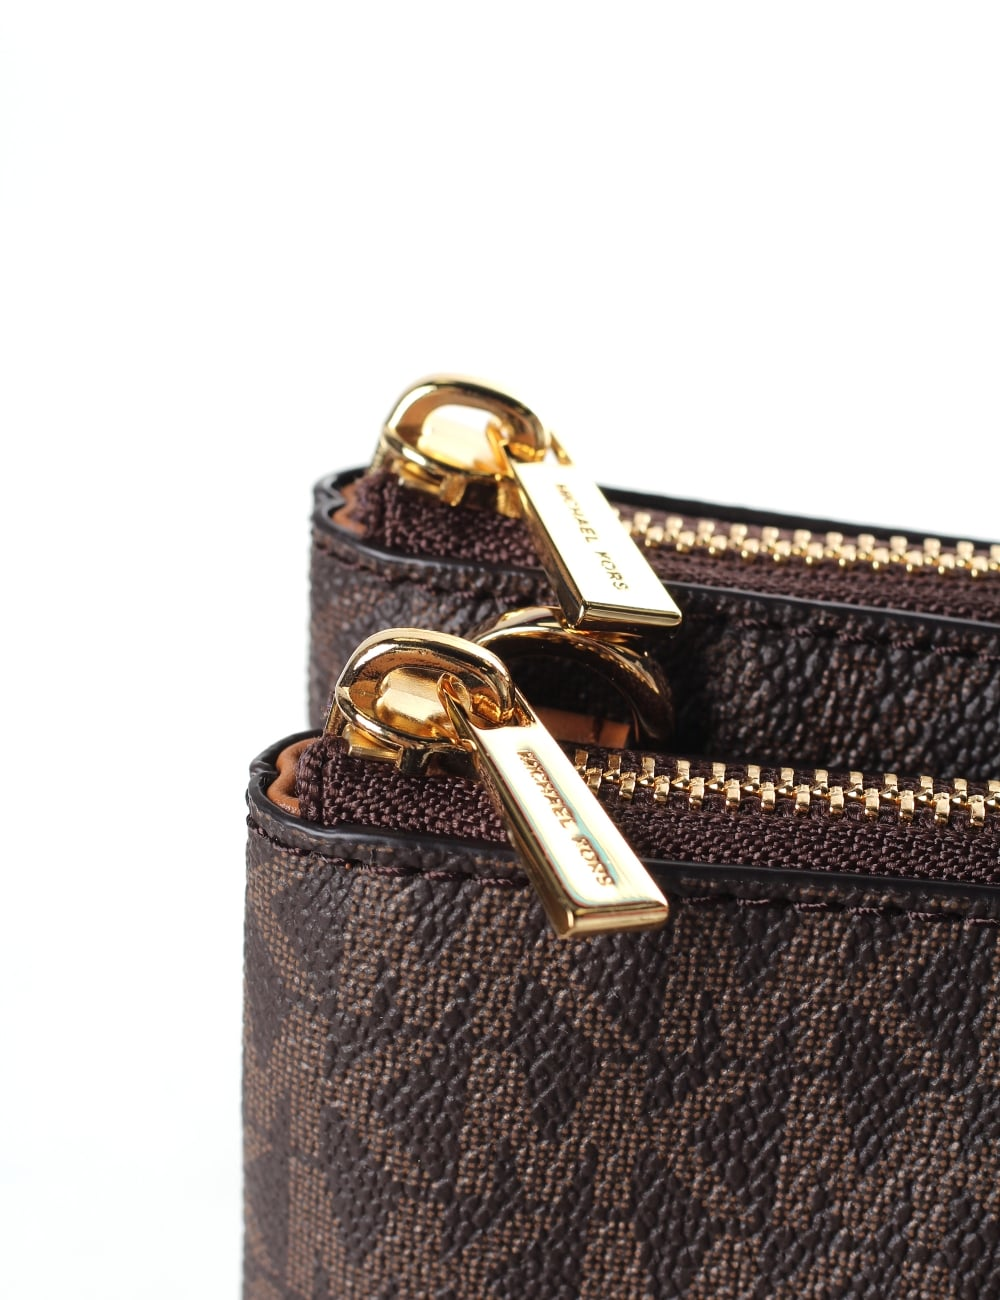 3a92657c7c1b20 Michael Kors Women's Adele Double Zip Crossbody Bag